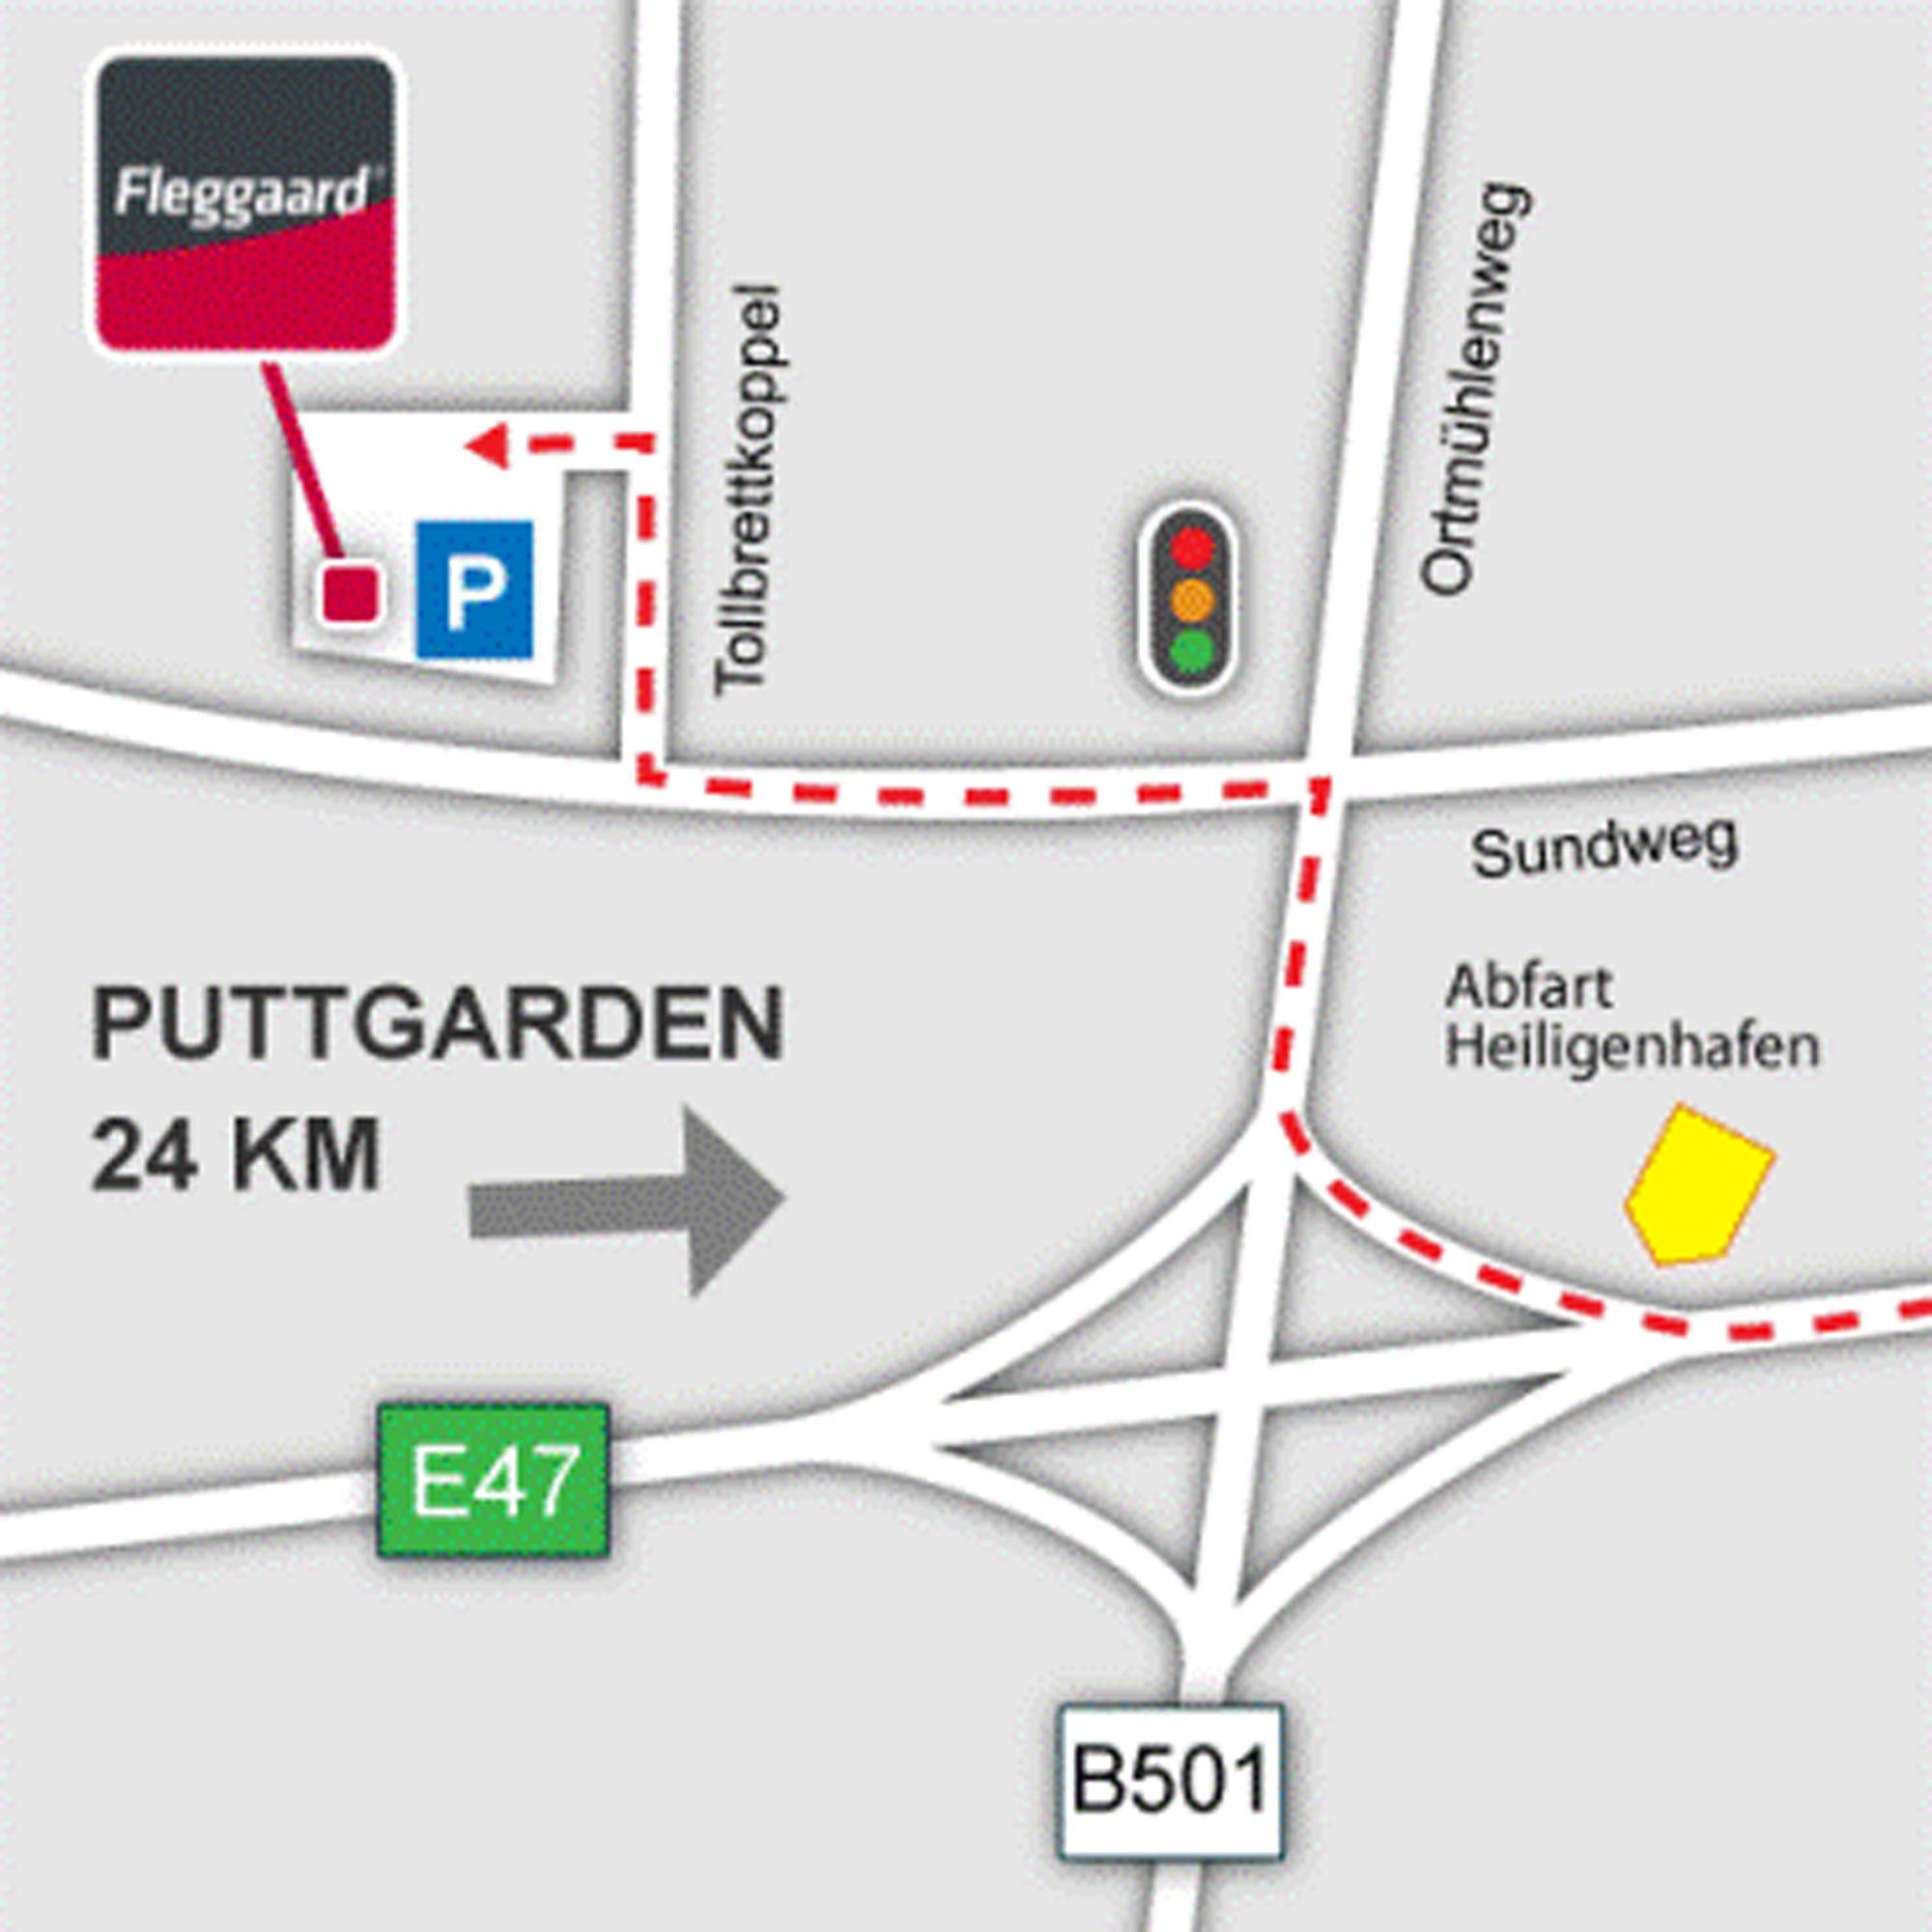 fleggaard heiligenhafen åbningstider